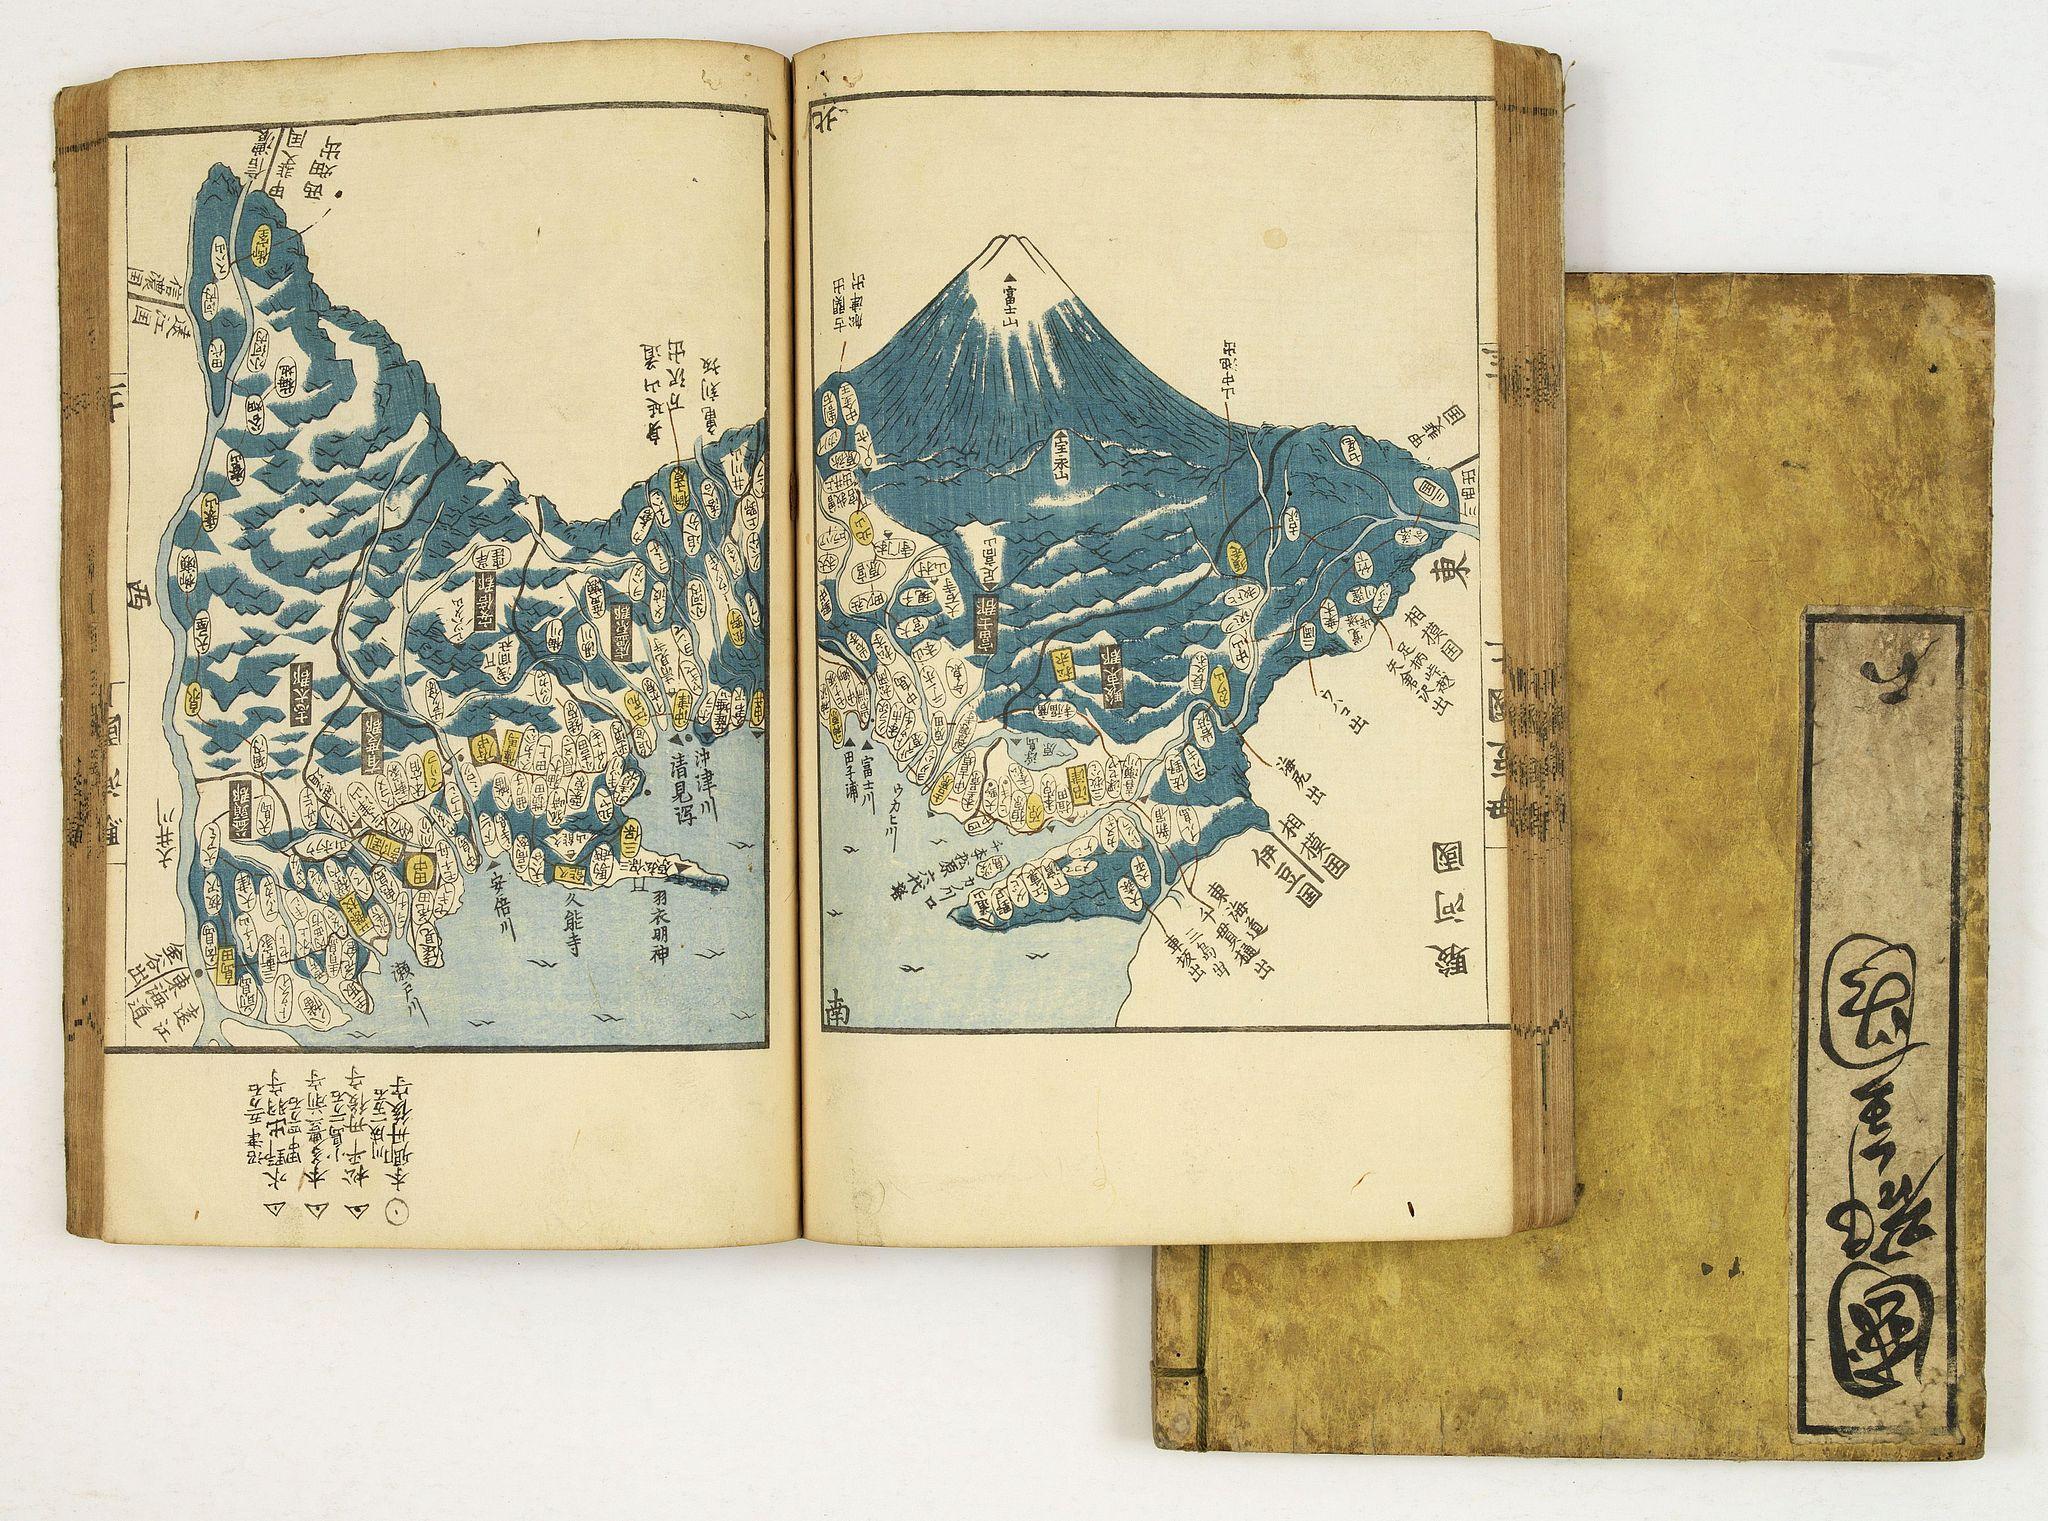 ANONYMOUS -  Aou, Tōkei. Kokugun Zenzu [Atlas of Provinces and Counties of Japan]. (volume 1-2).